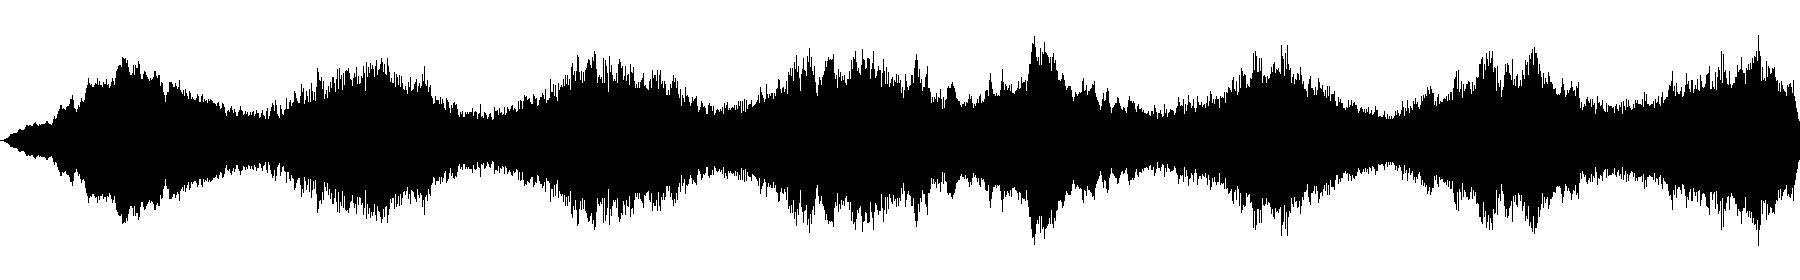 dts chordlp 27b cm